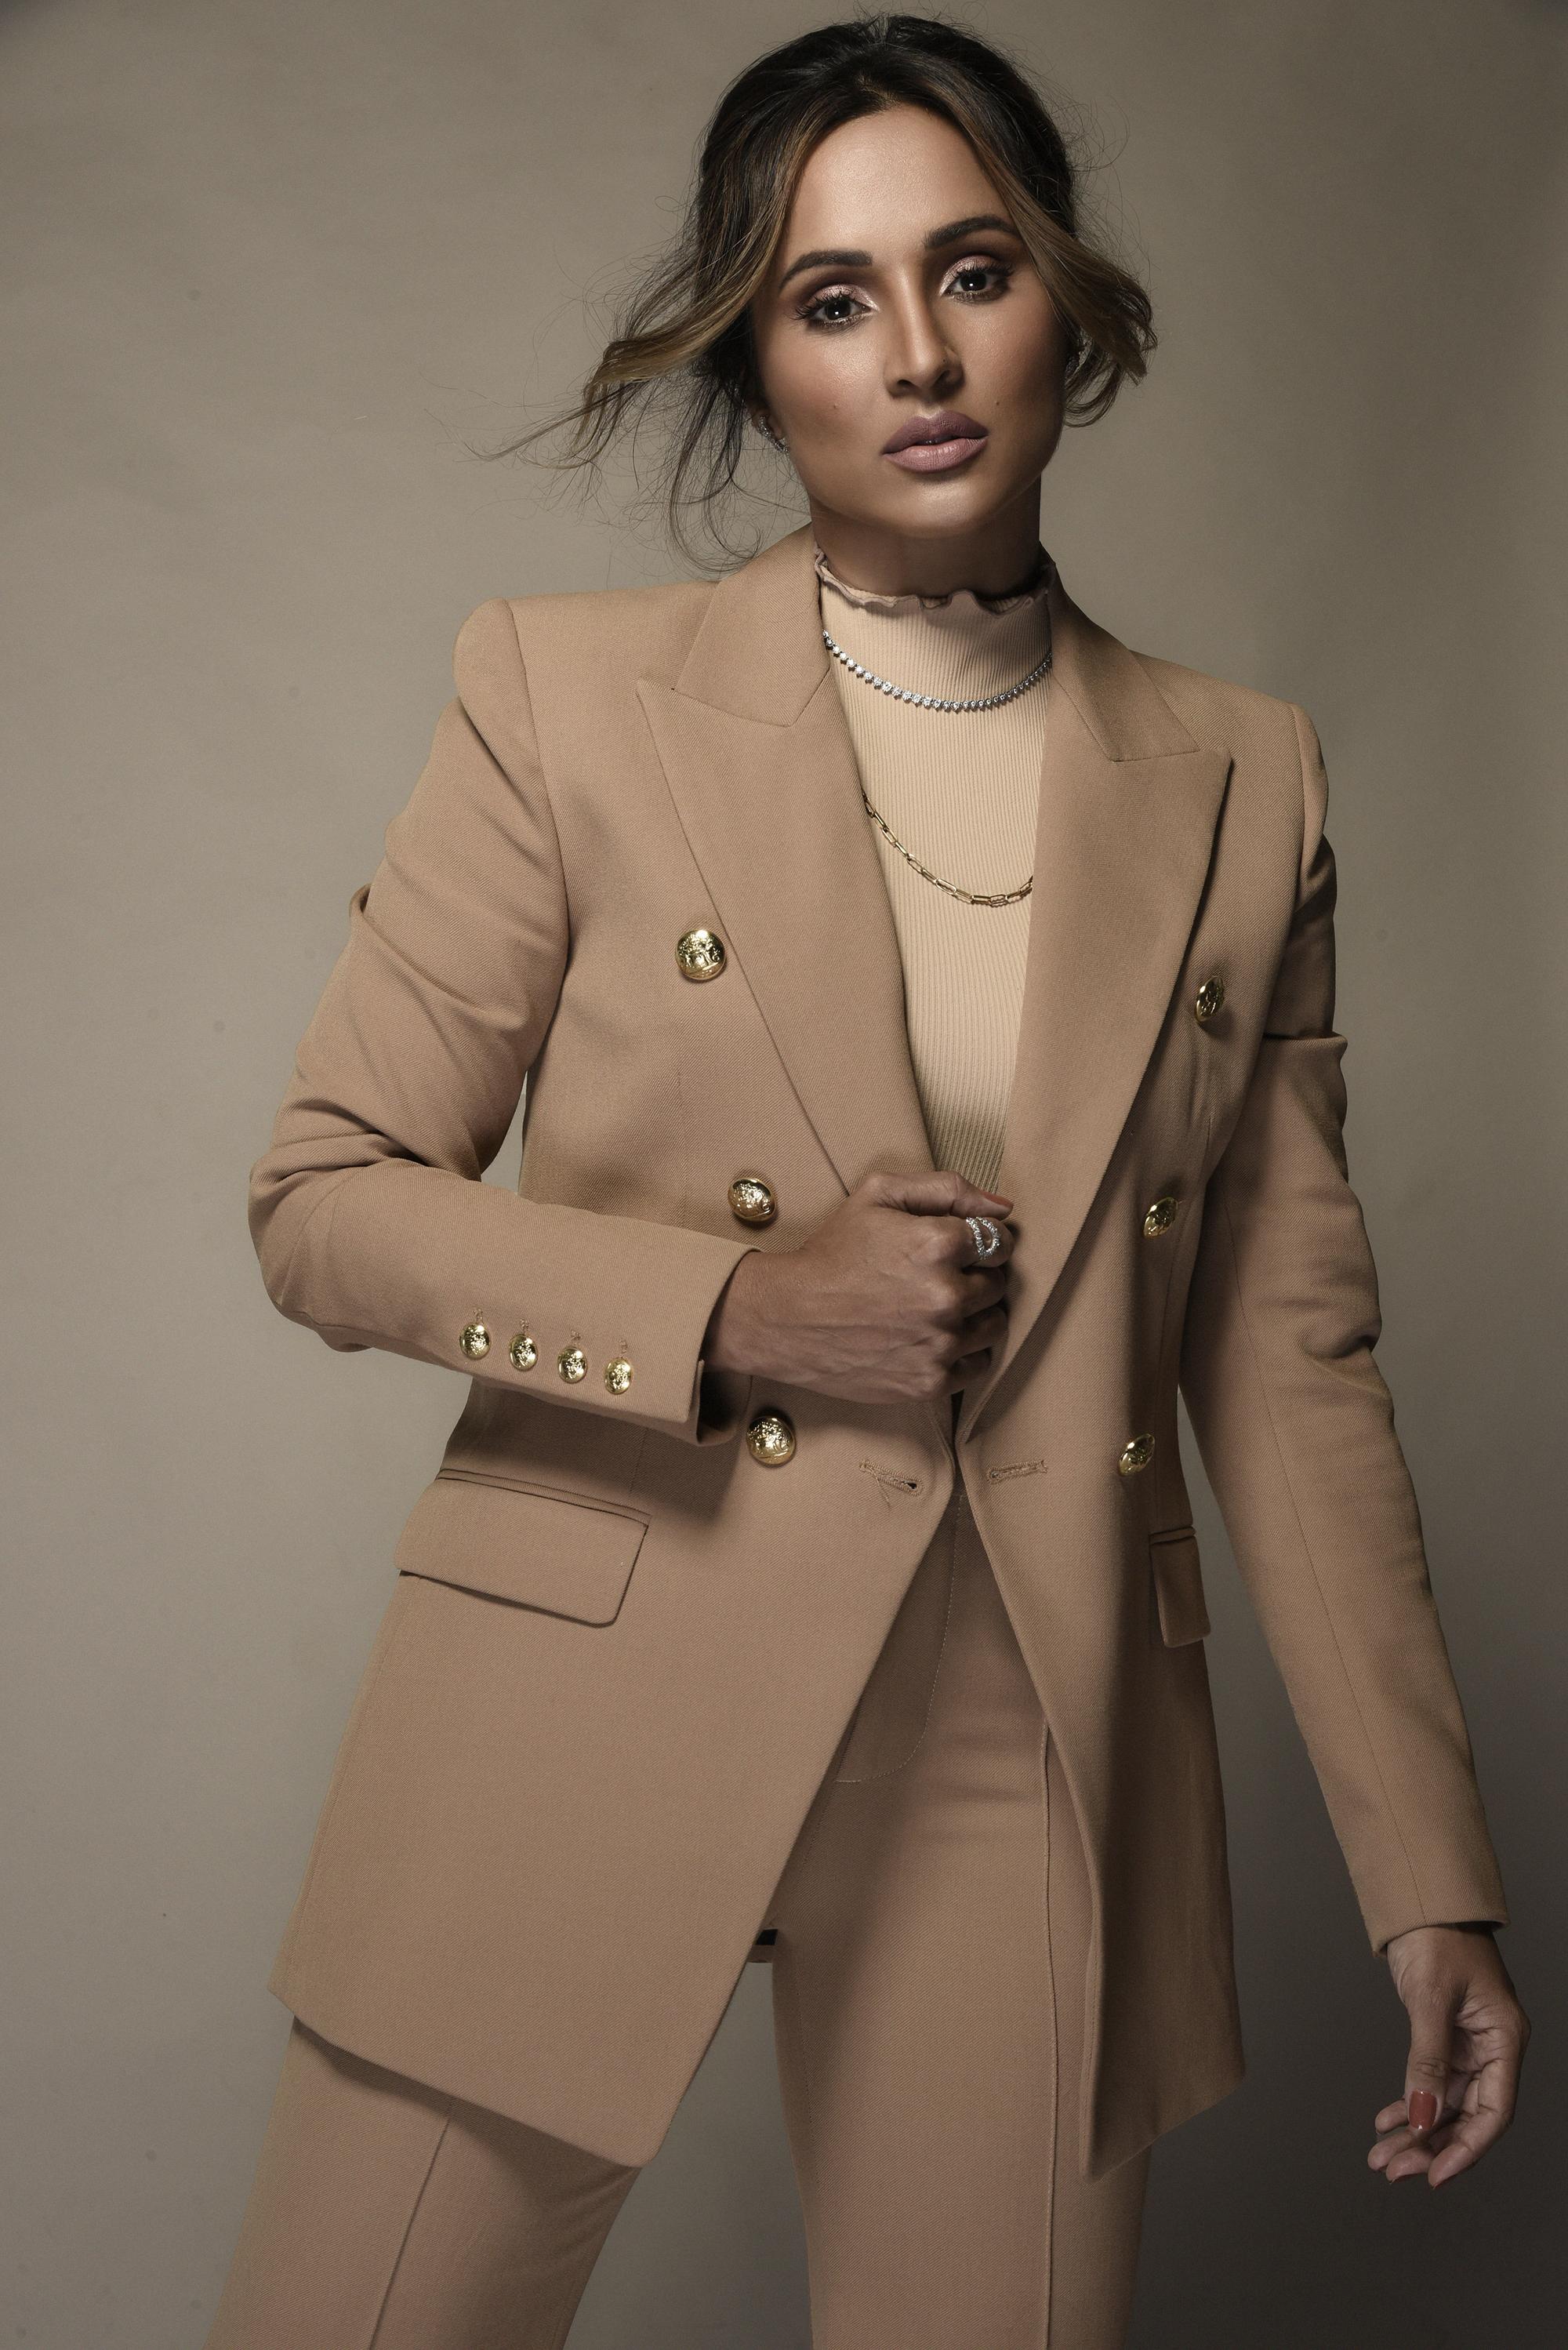 Thaíssa Carvalho para Vogue Brasil